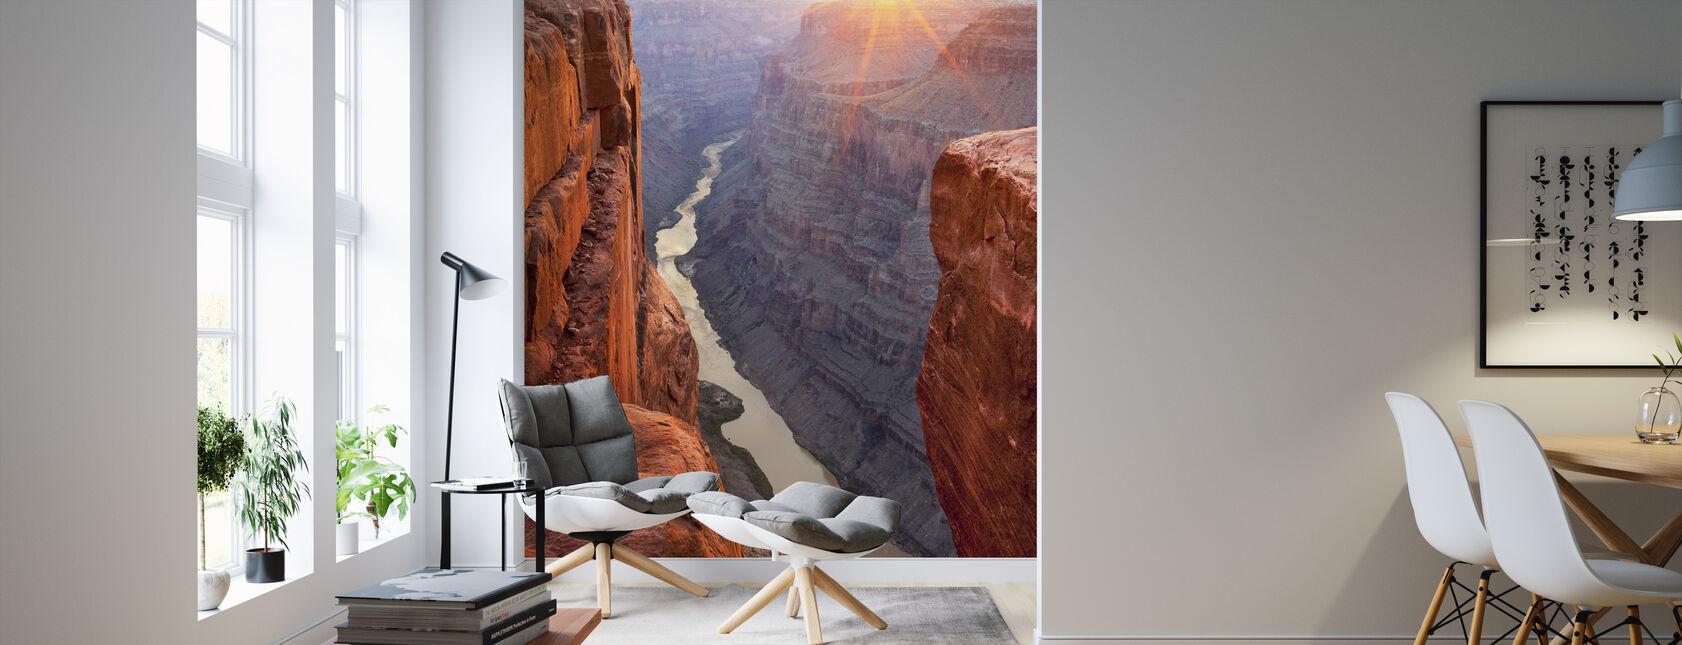 Solopgang Over Grand Canyon, Arizona - Tapet - Stue